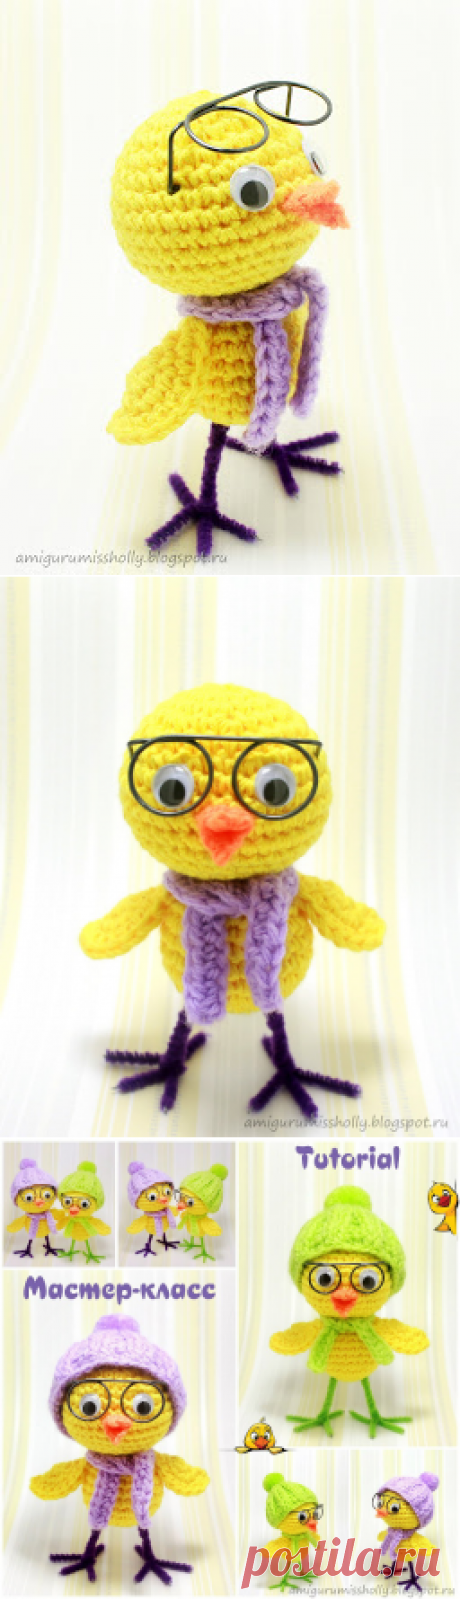 Amigurumi Cracker Girl Bunny Free Pattern-Part-3 - Tiny Mini ... | 1599x460